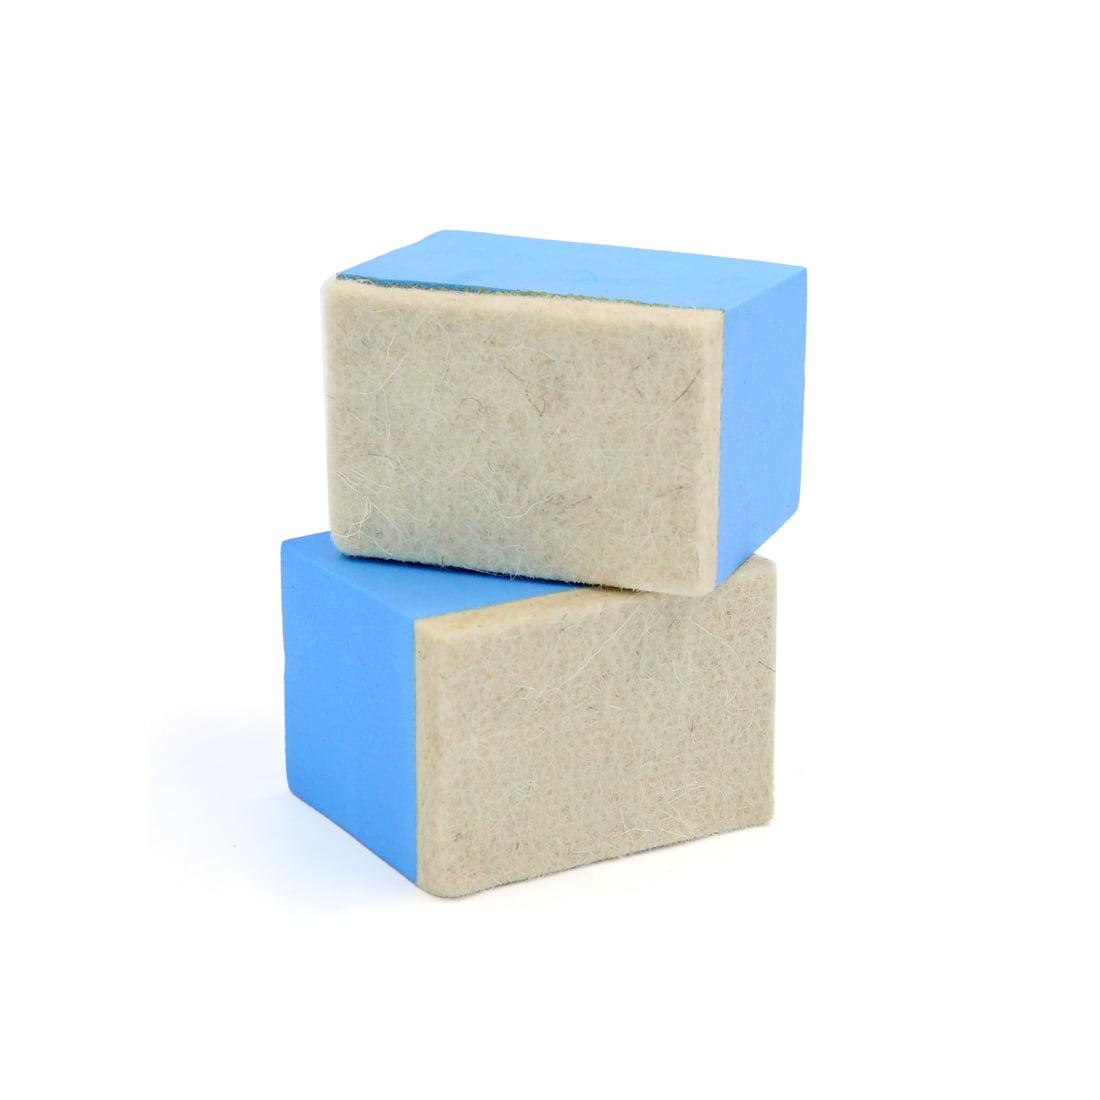 2Pcs Blue Beige Sponge  Car Vehicle Polishing Pad Waxing Buffing Tool - image 1 of 2